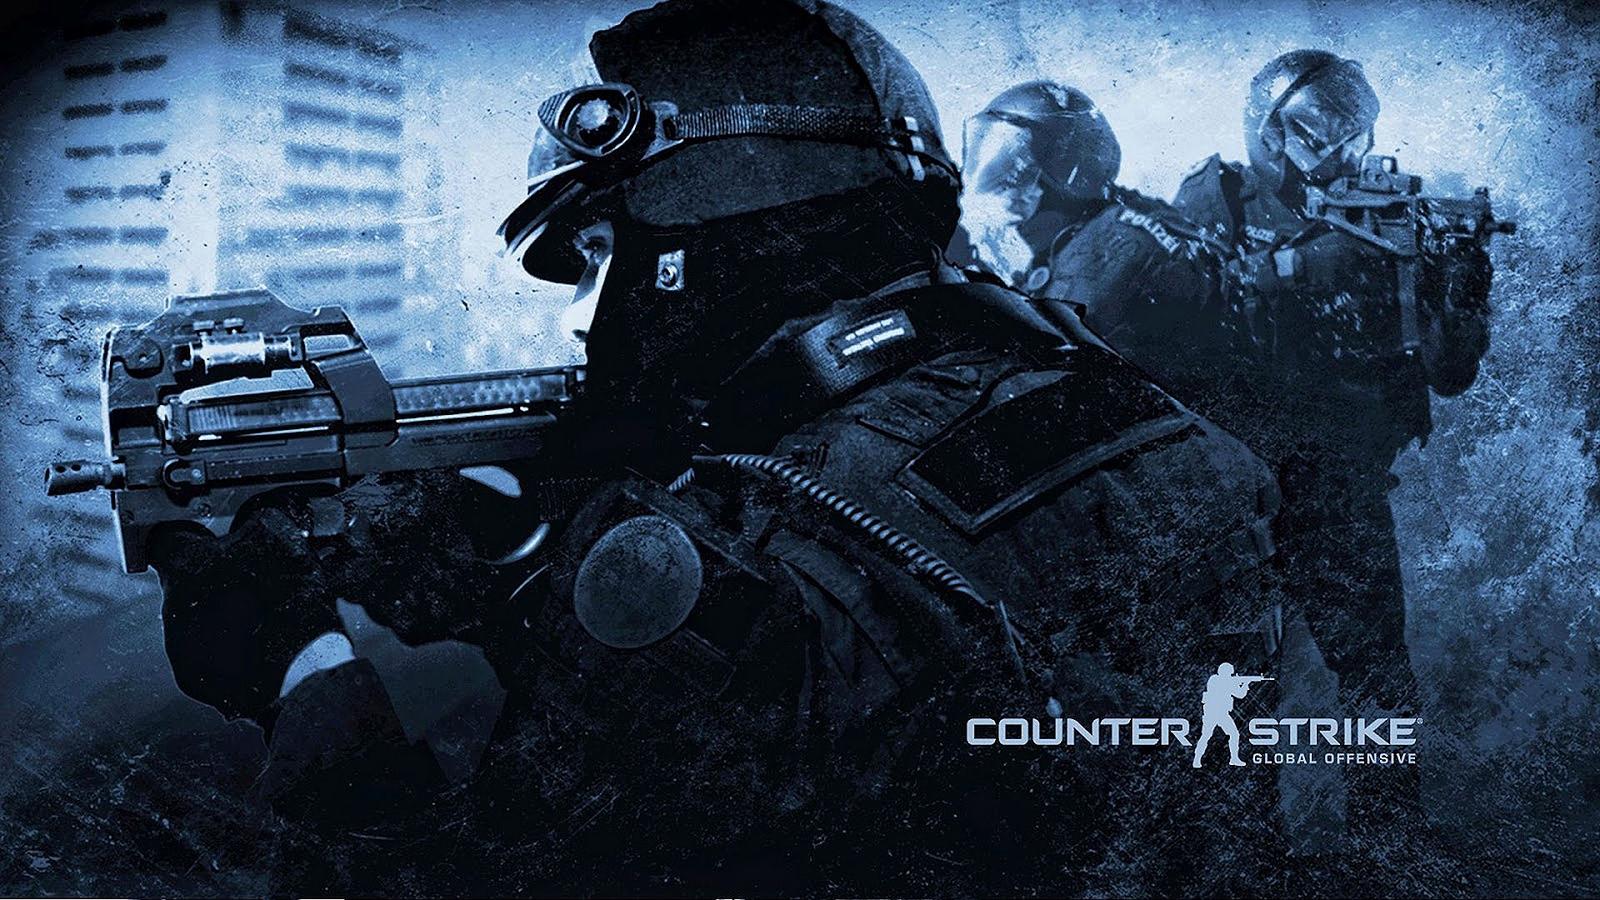 Download wallpaper 1600x900 counter strike global offensive cs 1600x900